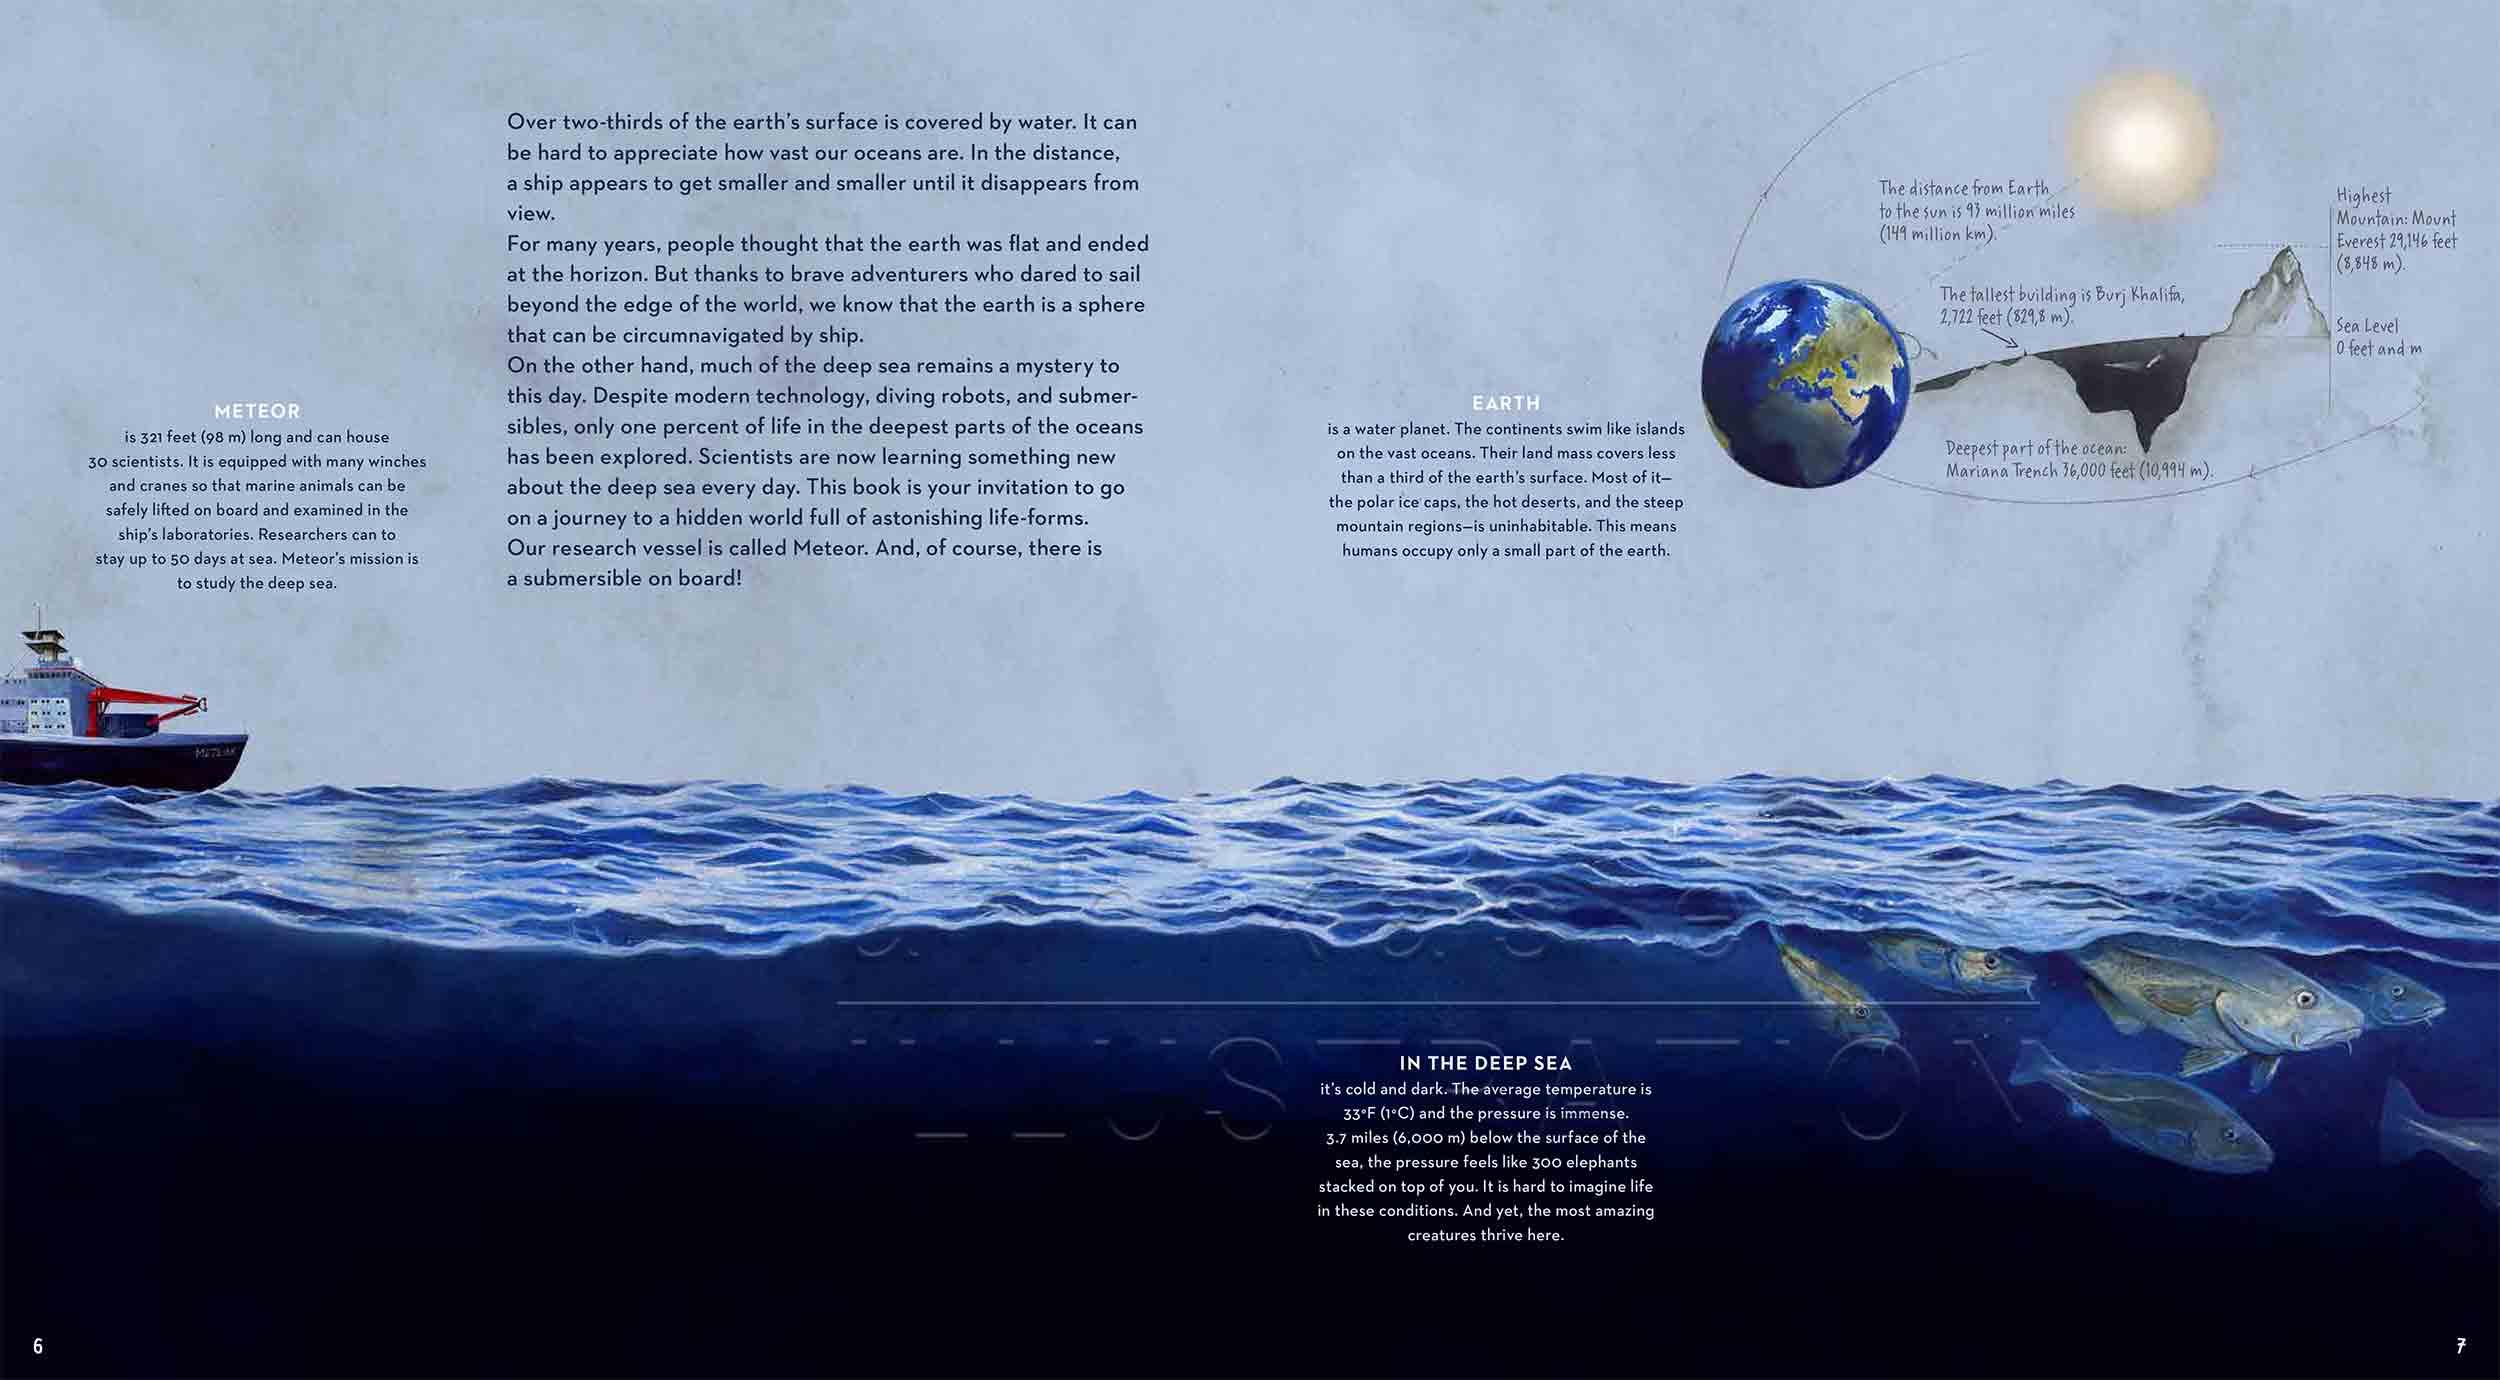 10-11deep-sea-Englisch-photosynthesis.jpg